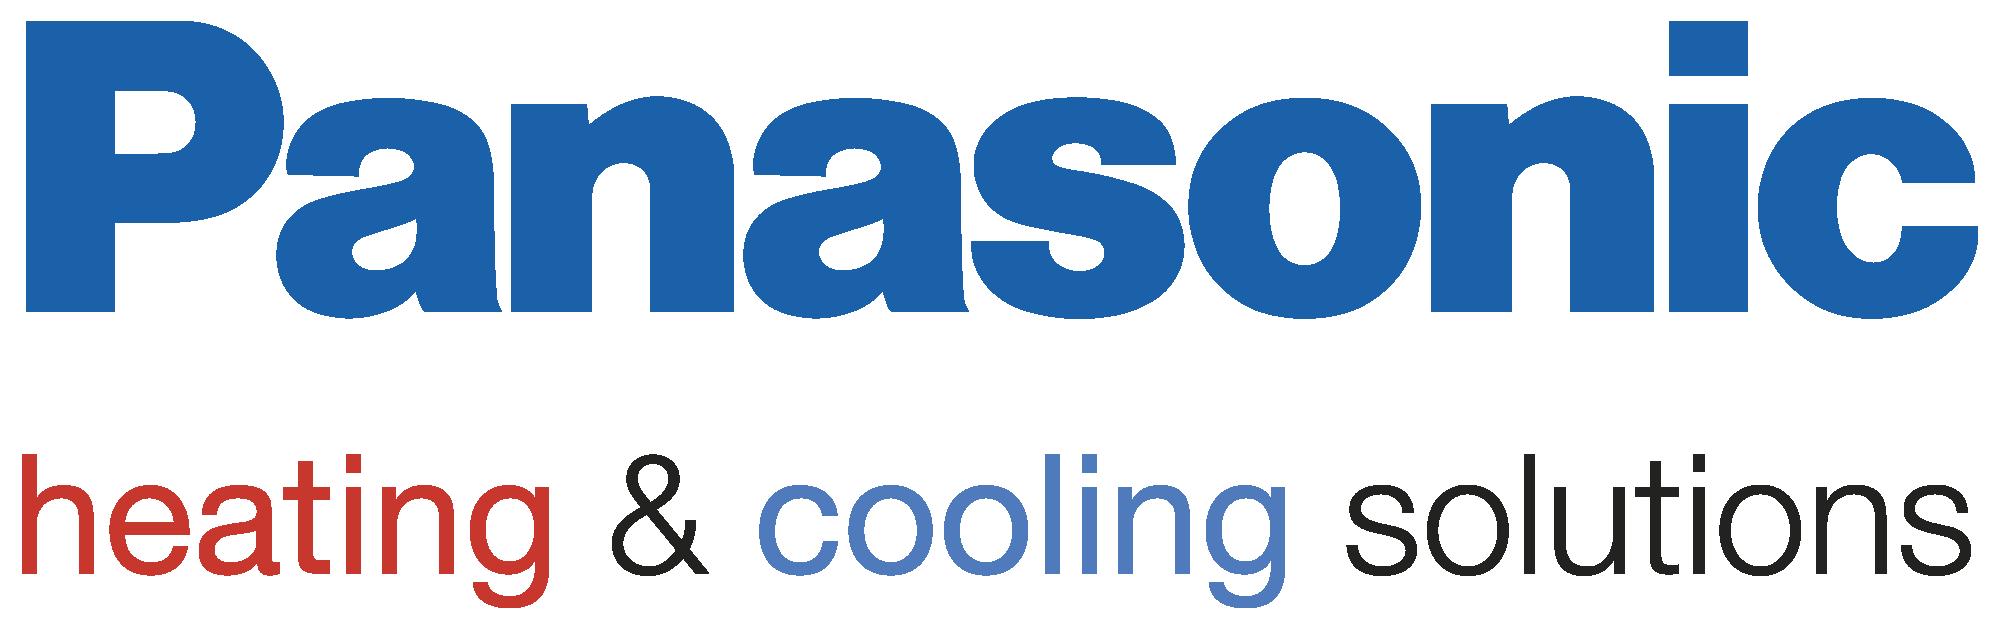 15HeatingCooling_PANASONIC